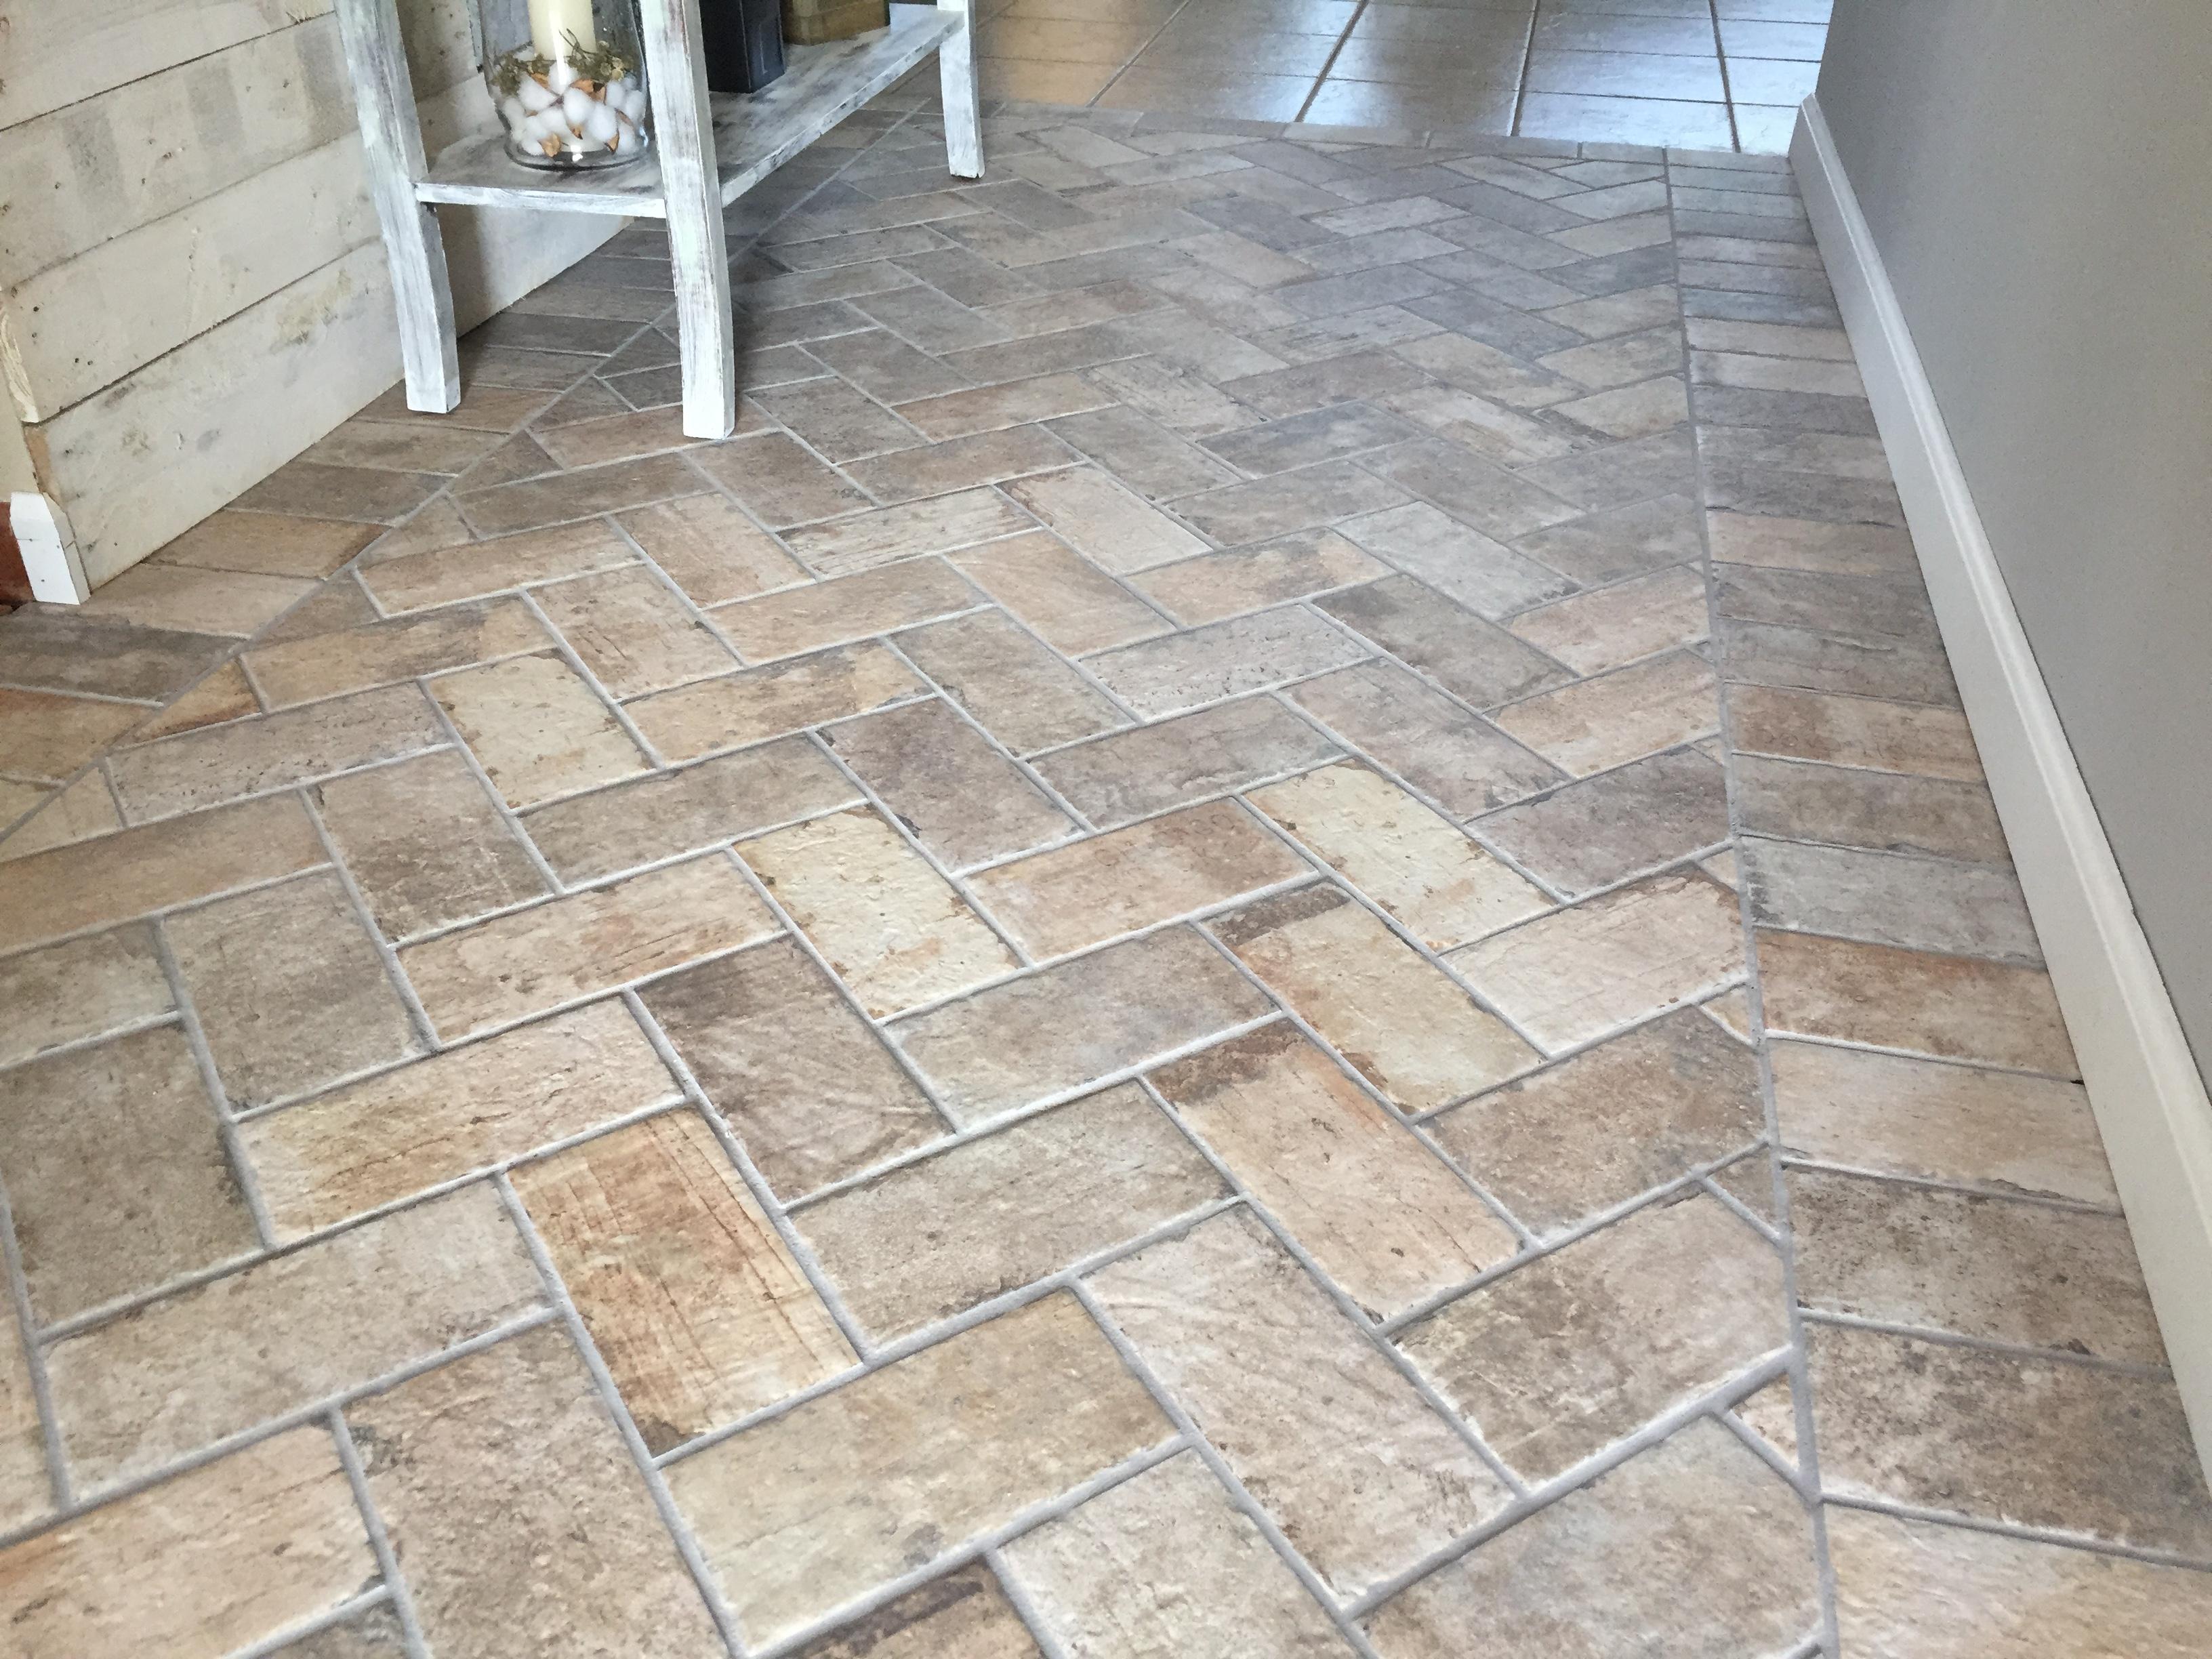 Brick Tile Floor Archives The Kelly Homestead